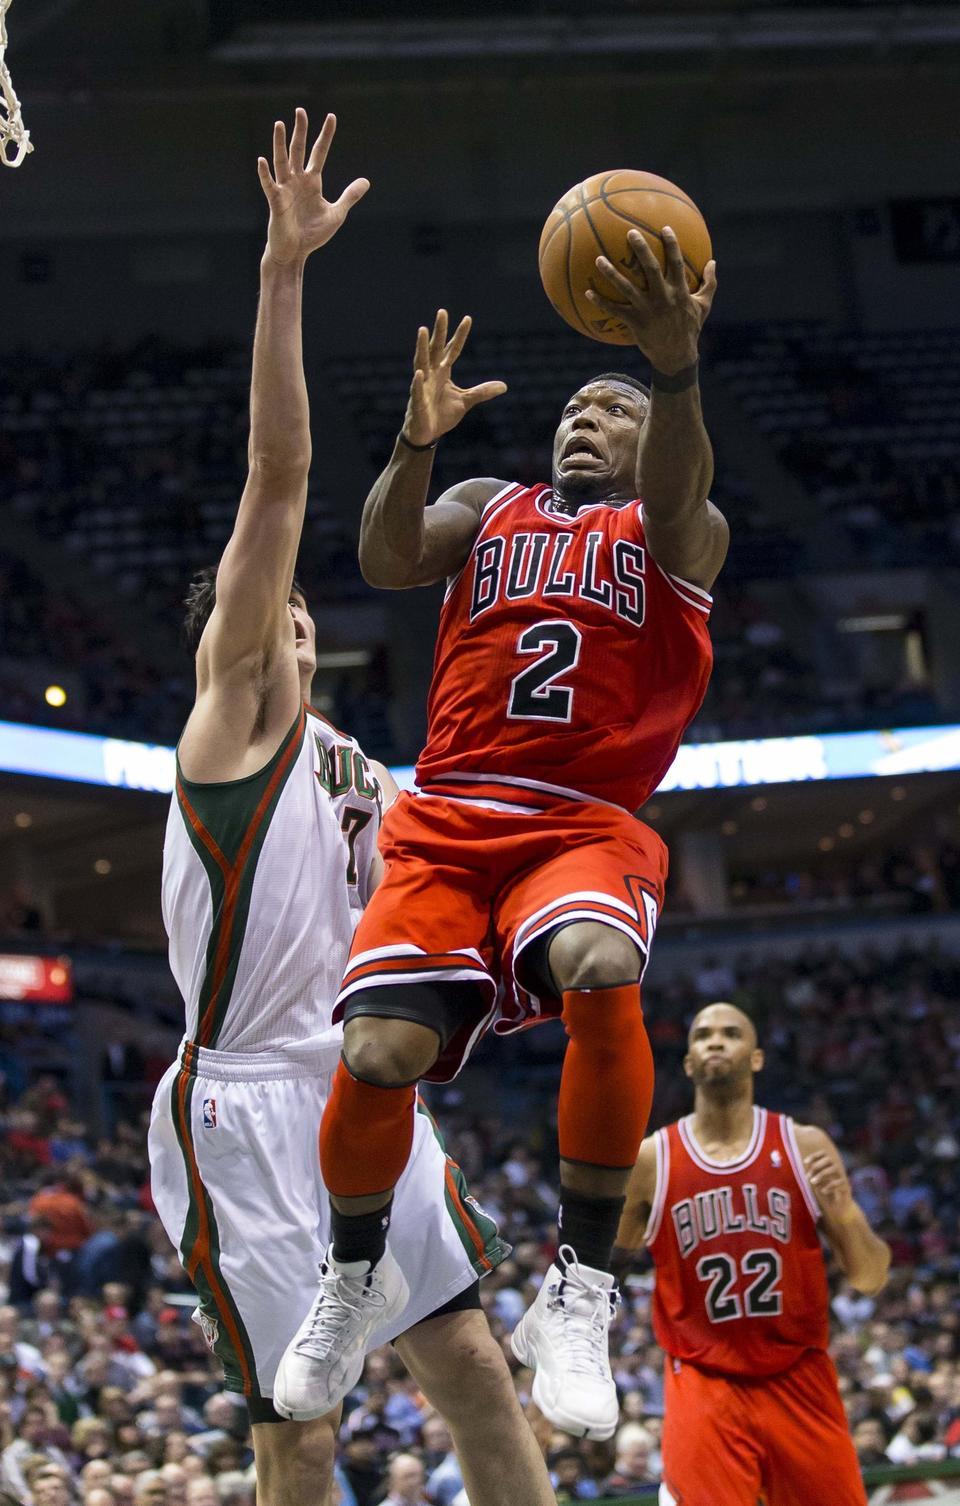 Bulls guard Nate Robinson drives for a shot as Milwaukee Bucks forward Ersan Ilyasova defends during the second quarter Wednesday at the BMO Harris Bradley Center.